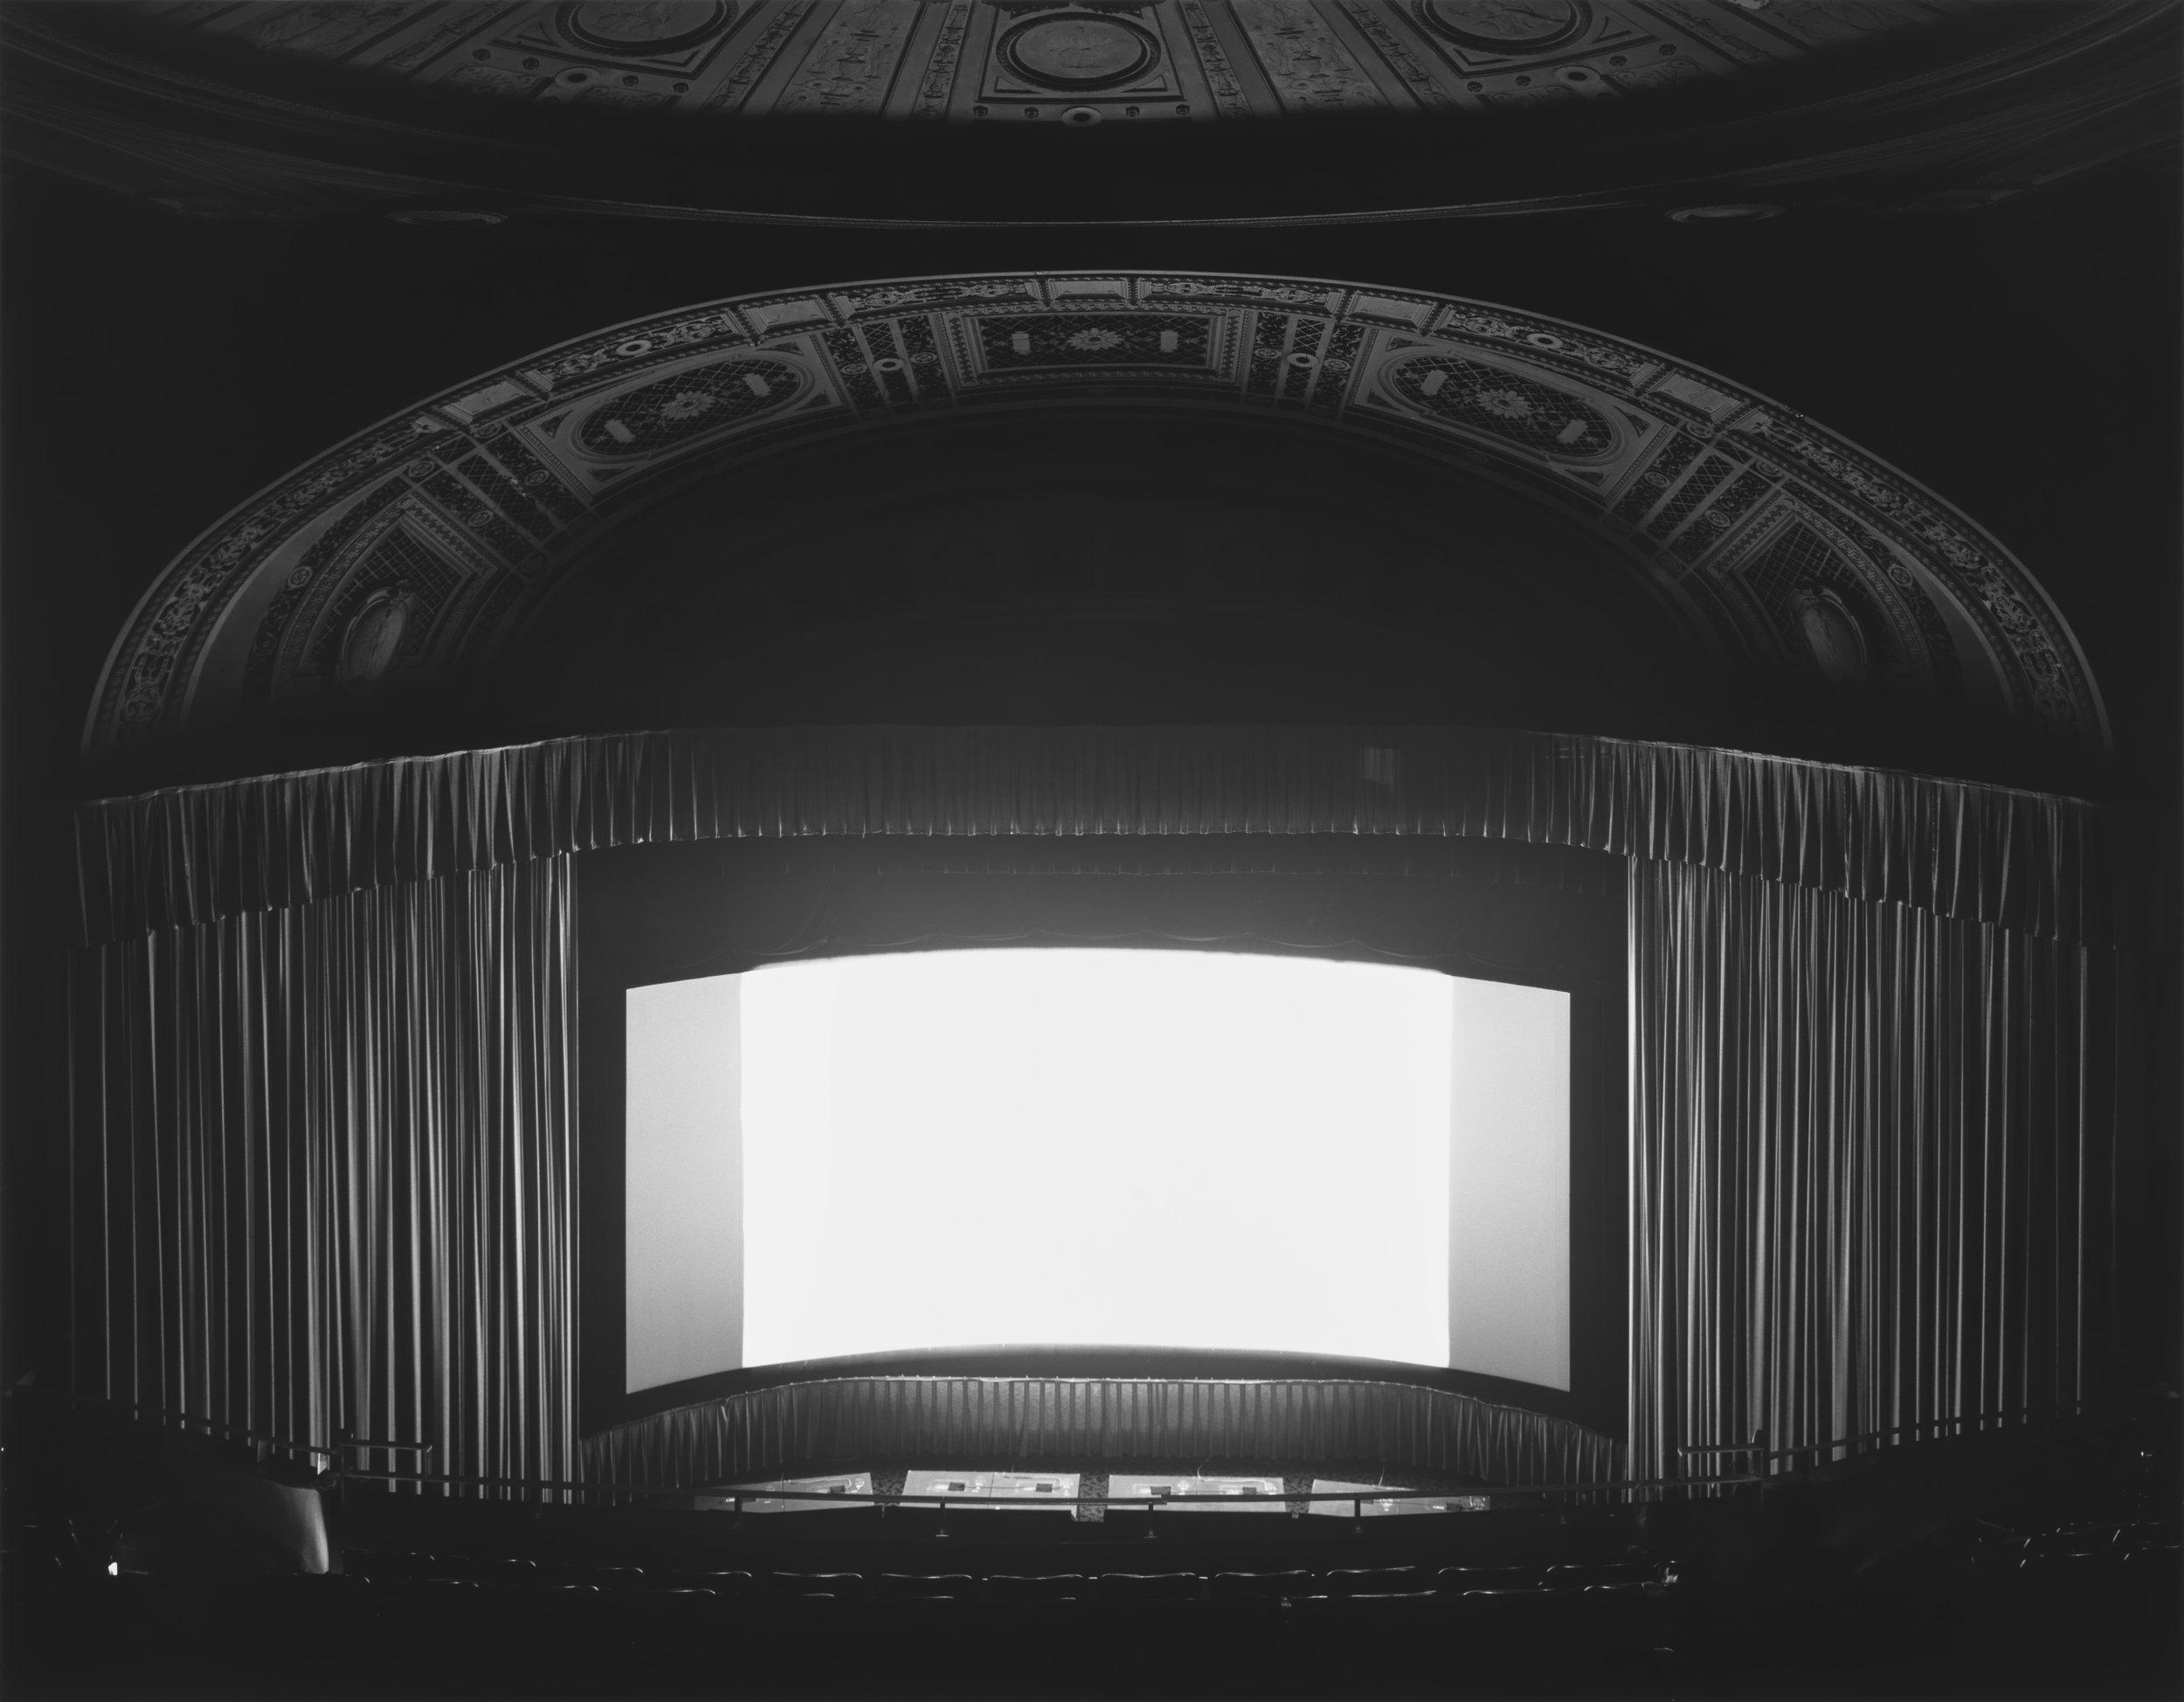 © Theaters by Hiroshi Sugimoto,U.A. Rivoli, New York, 1977